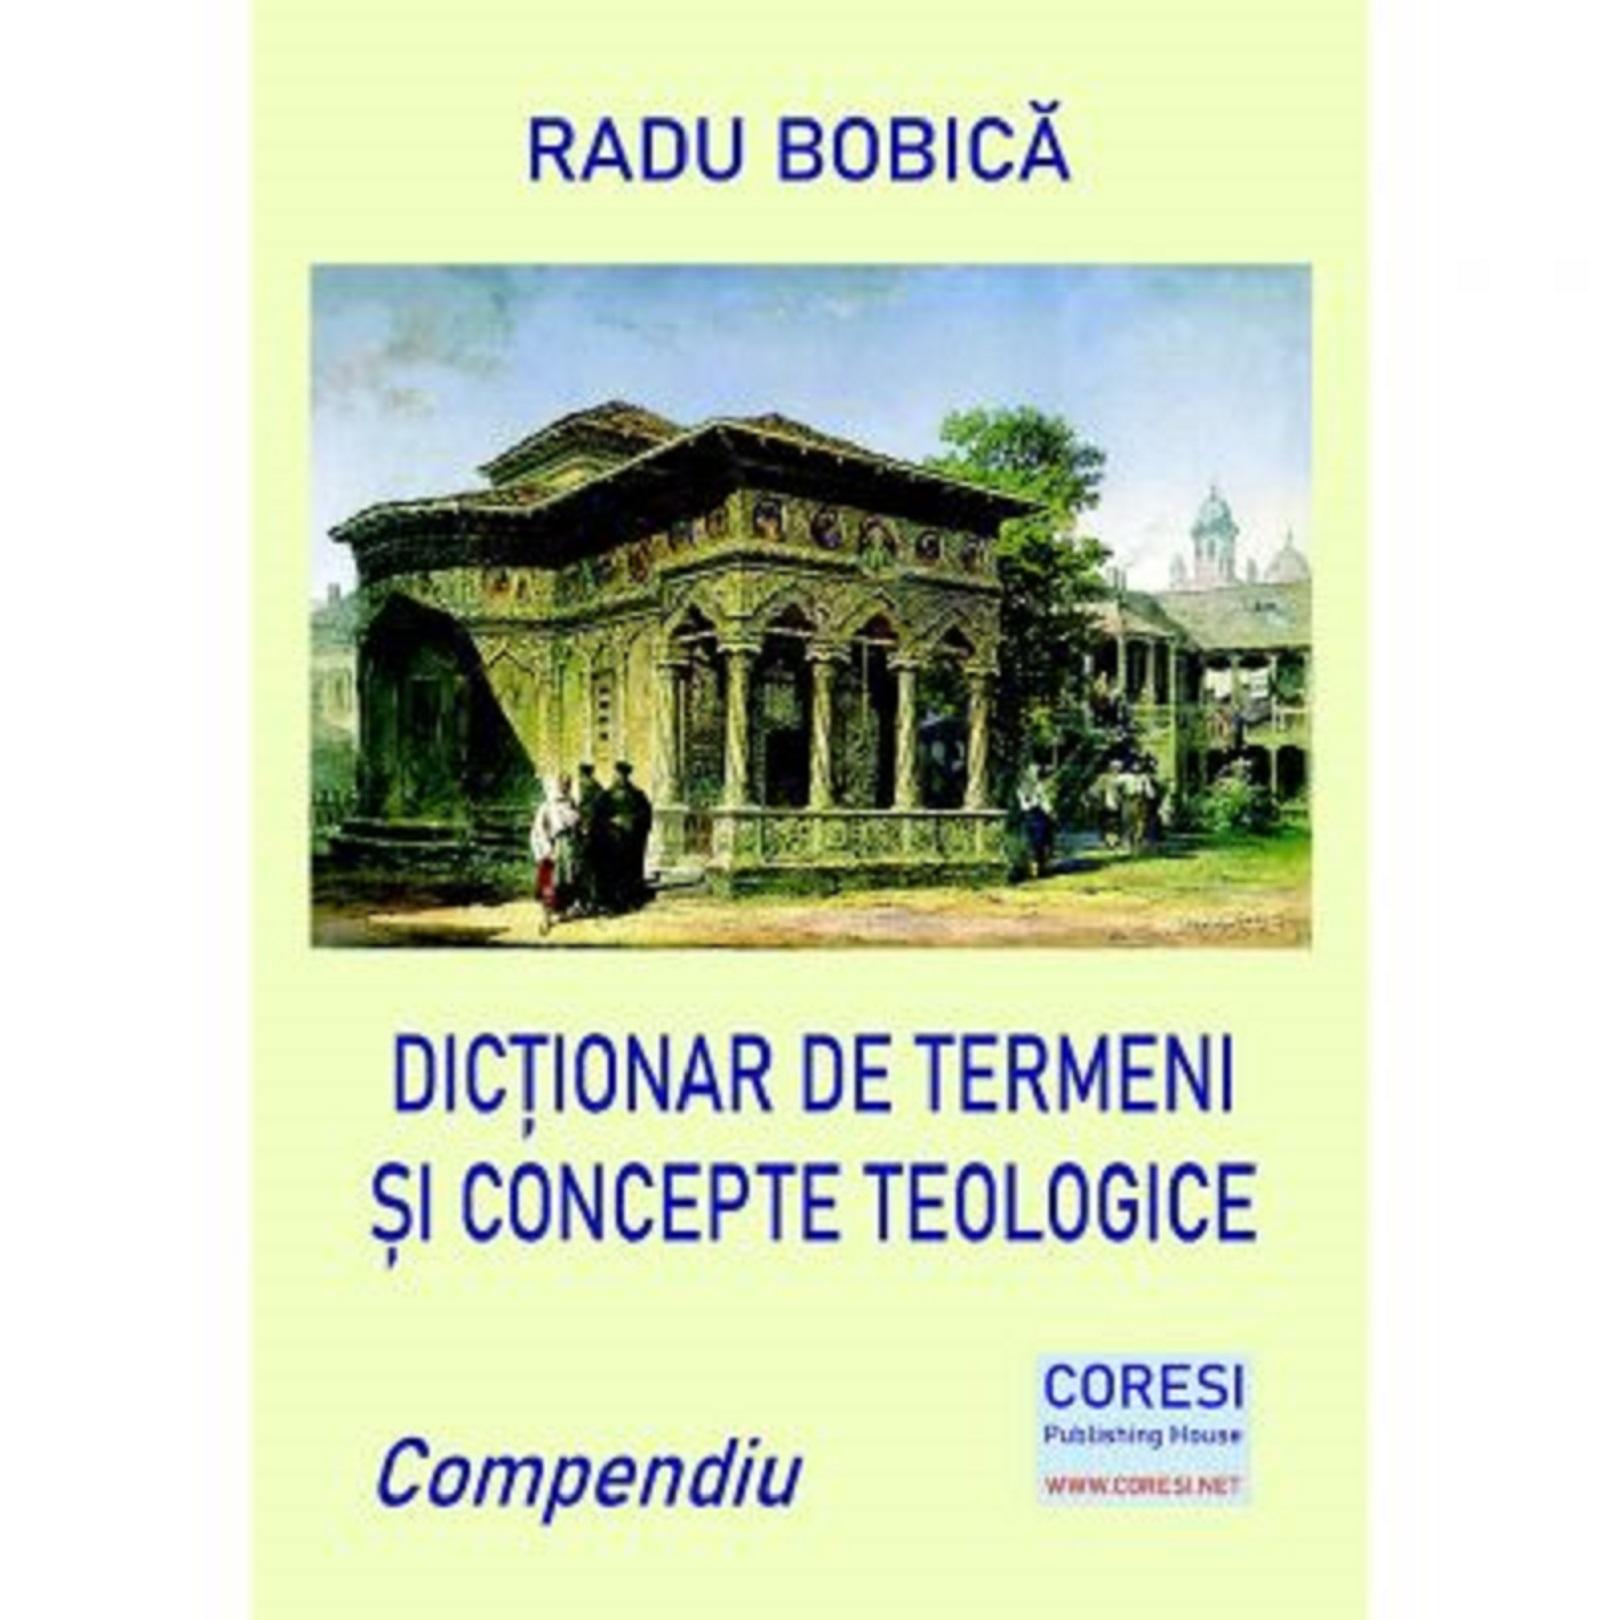 Dictionar de termeni si concepte teologice